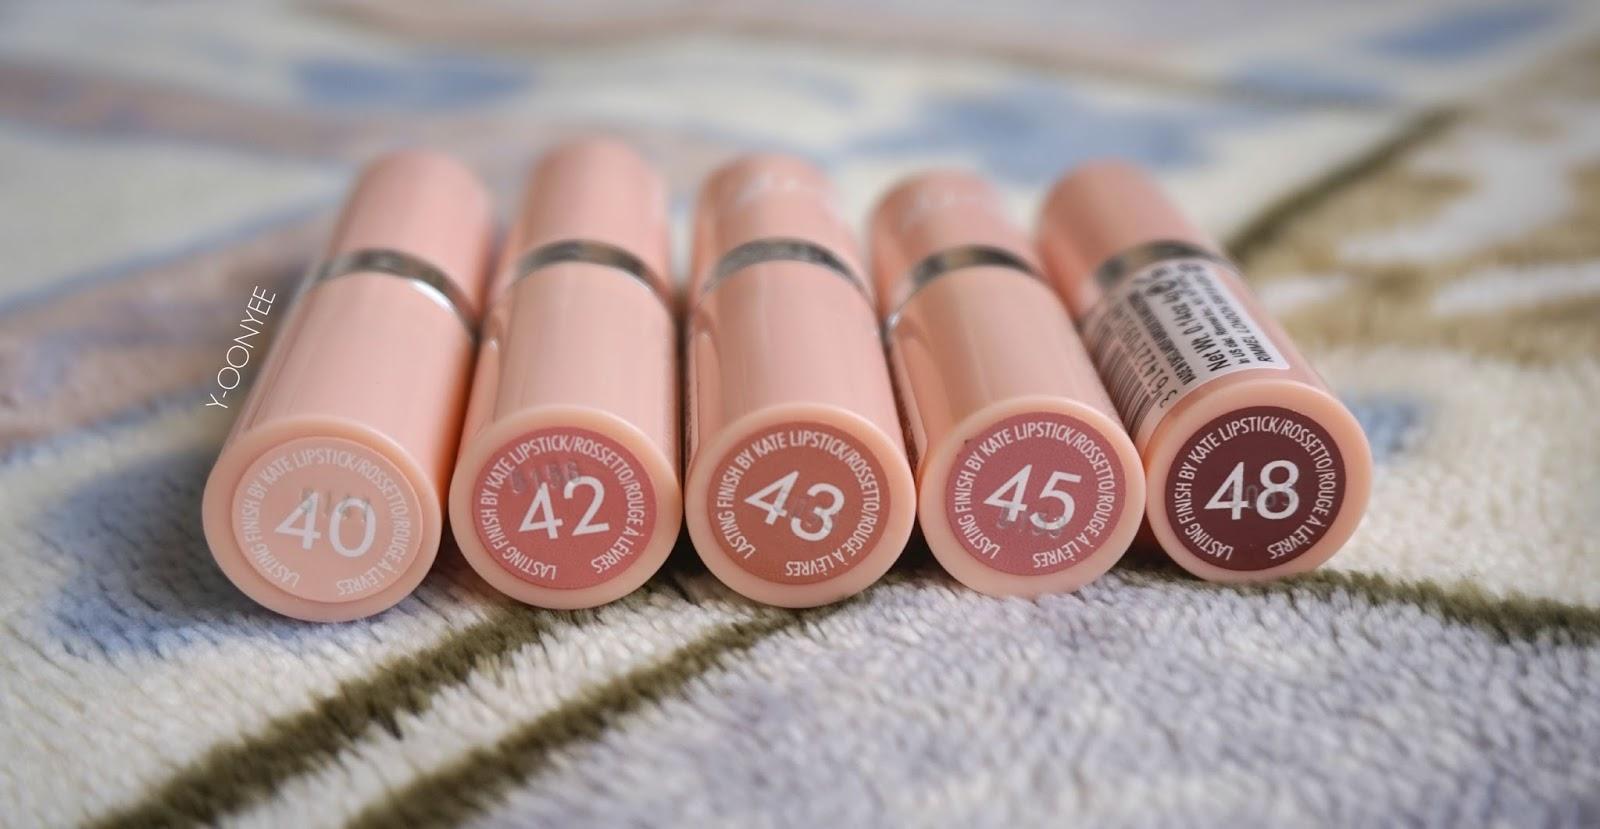 Rimmel London lasting finish by Kate Nude lipstick